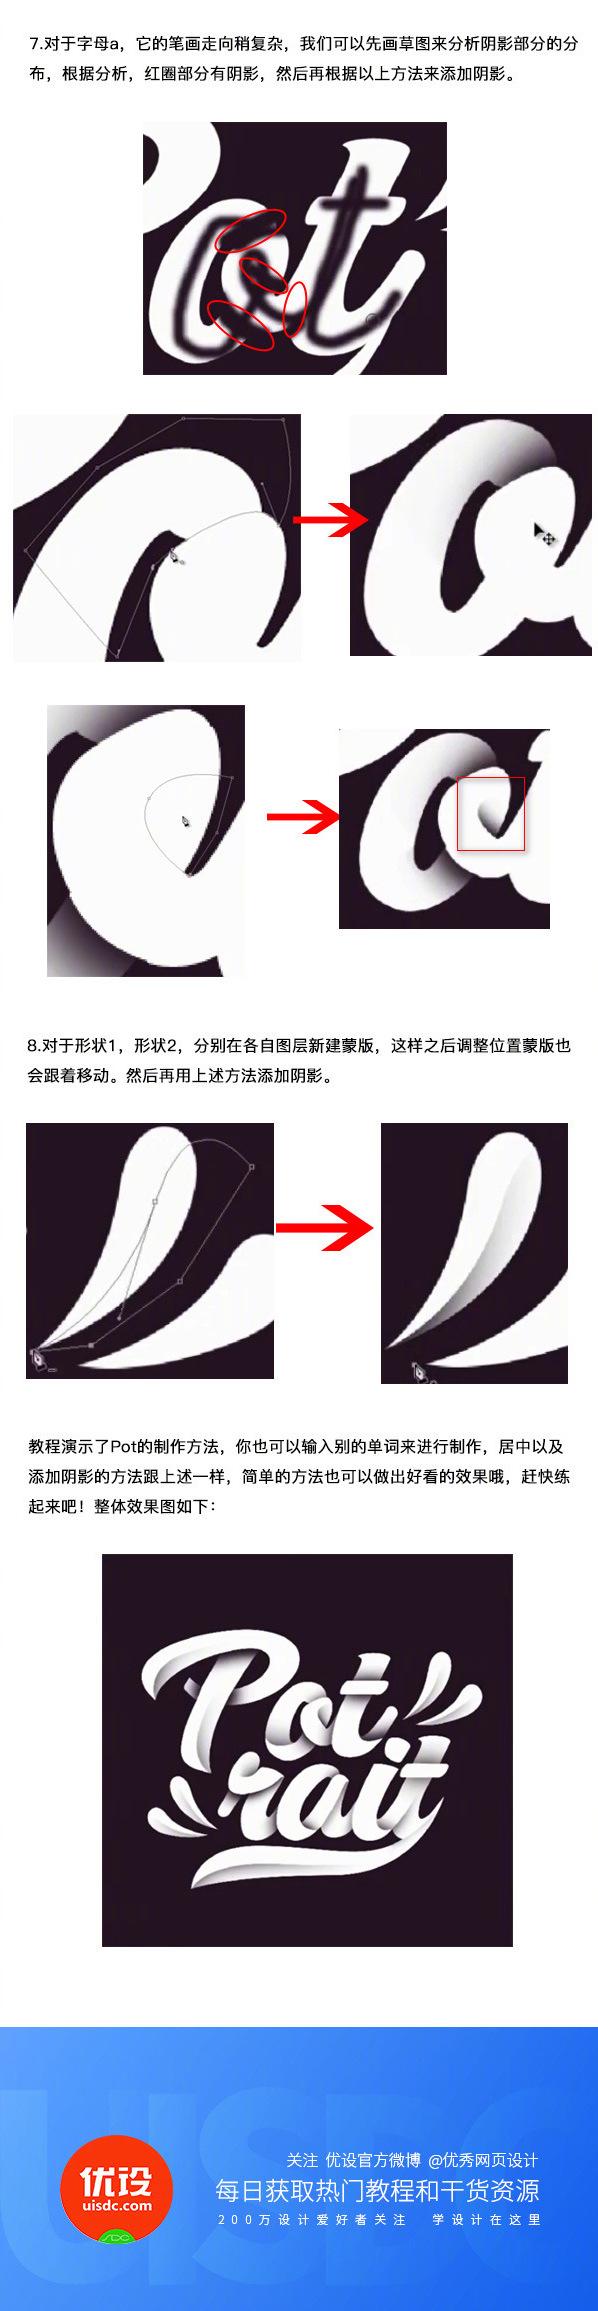 PS基础教程!教你用8步做出一款简单阴影字效(含素材)